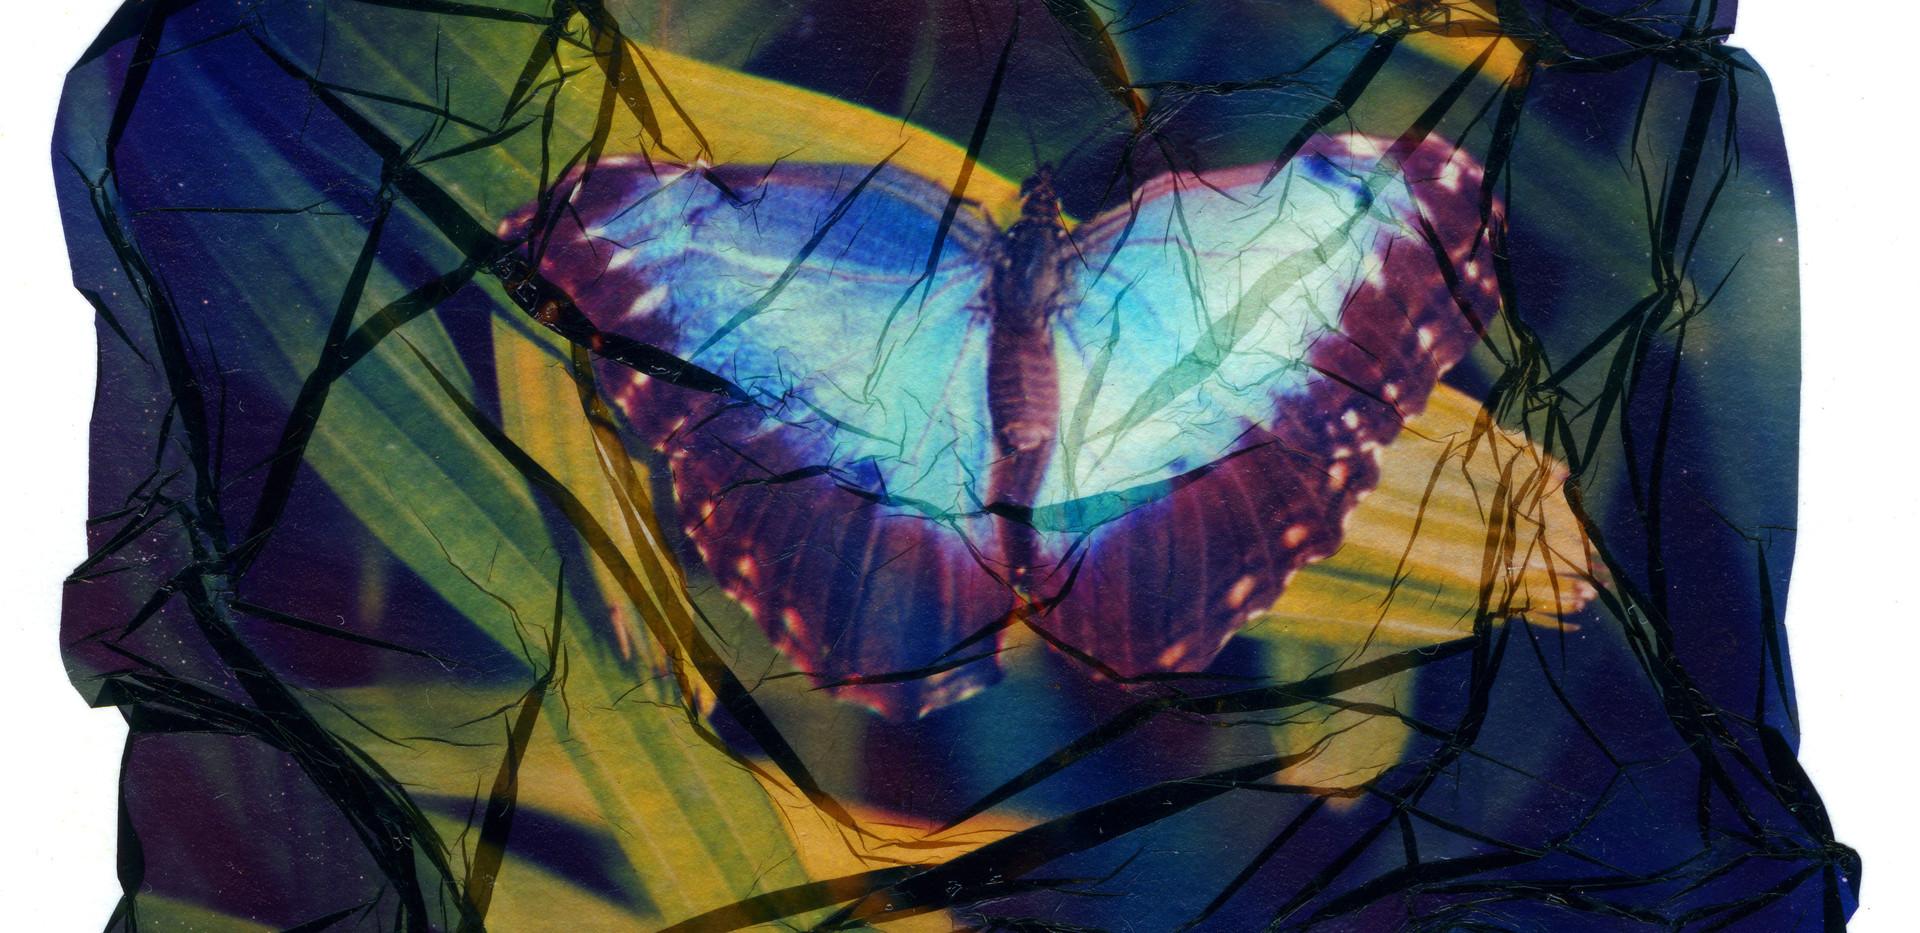 Polrd Lift - Butterfly001.jpg